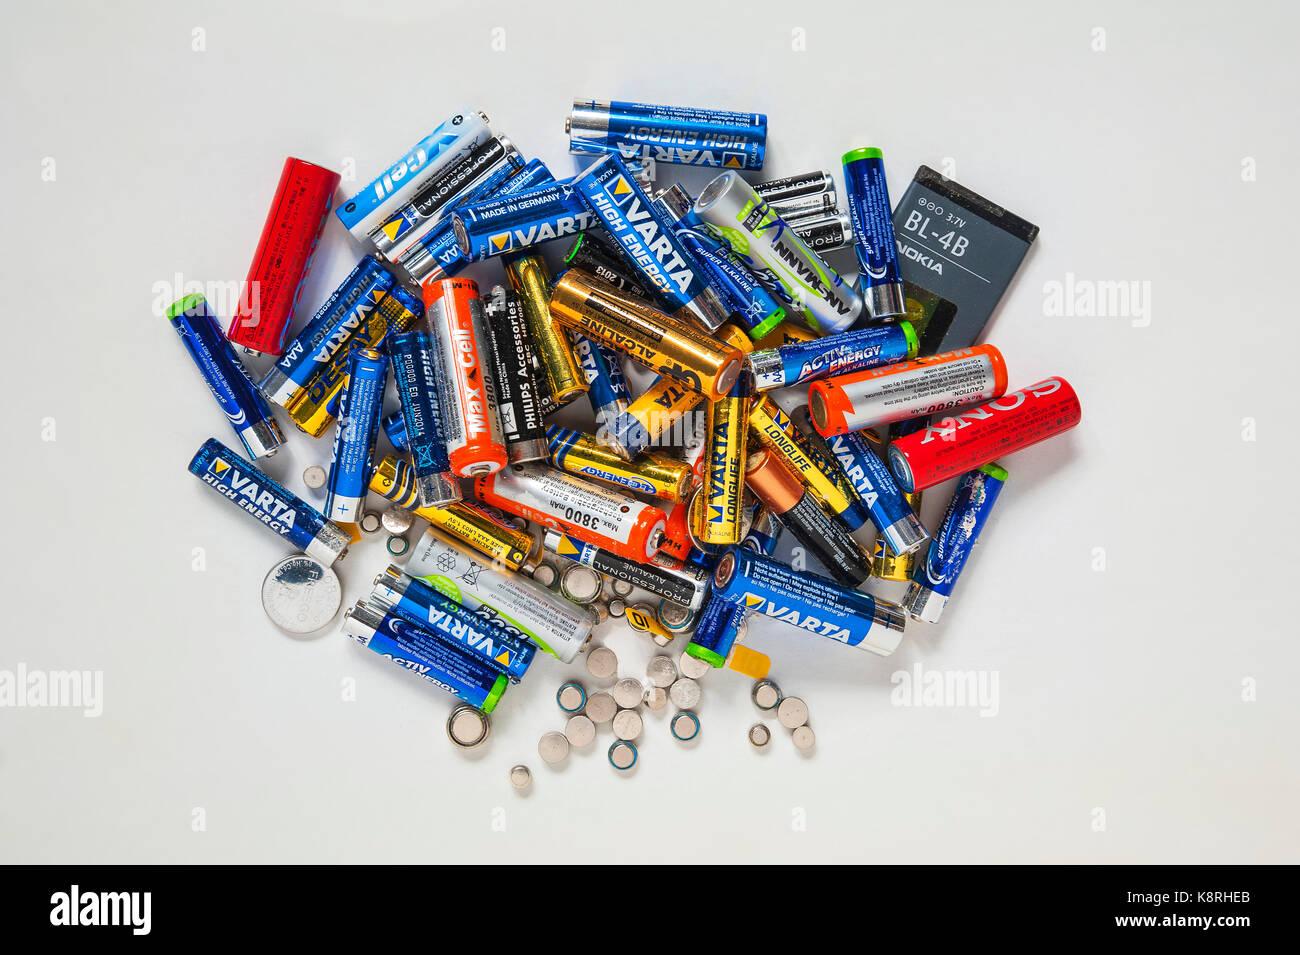 Various batteries and accumulators, Germany - Stock Image